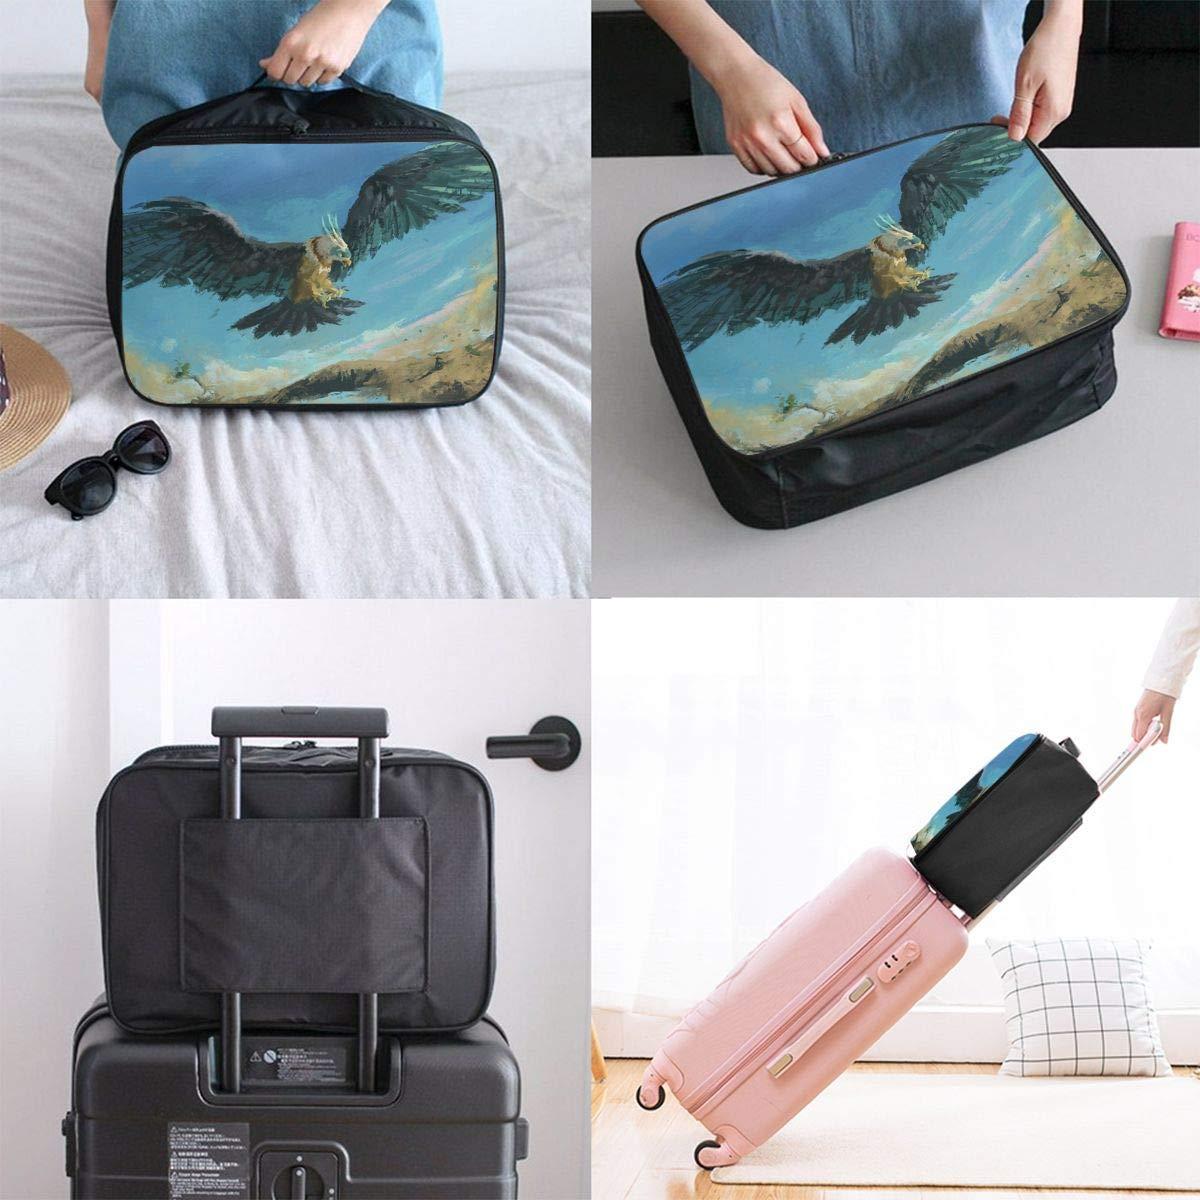 Lightweight Large Capacity Portable Luggage Bag Eagle Bird Print Travel Duffel Bag Backpack